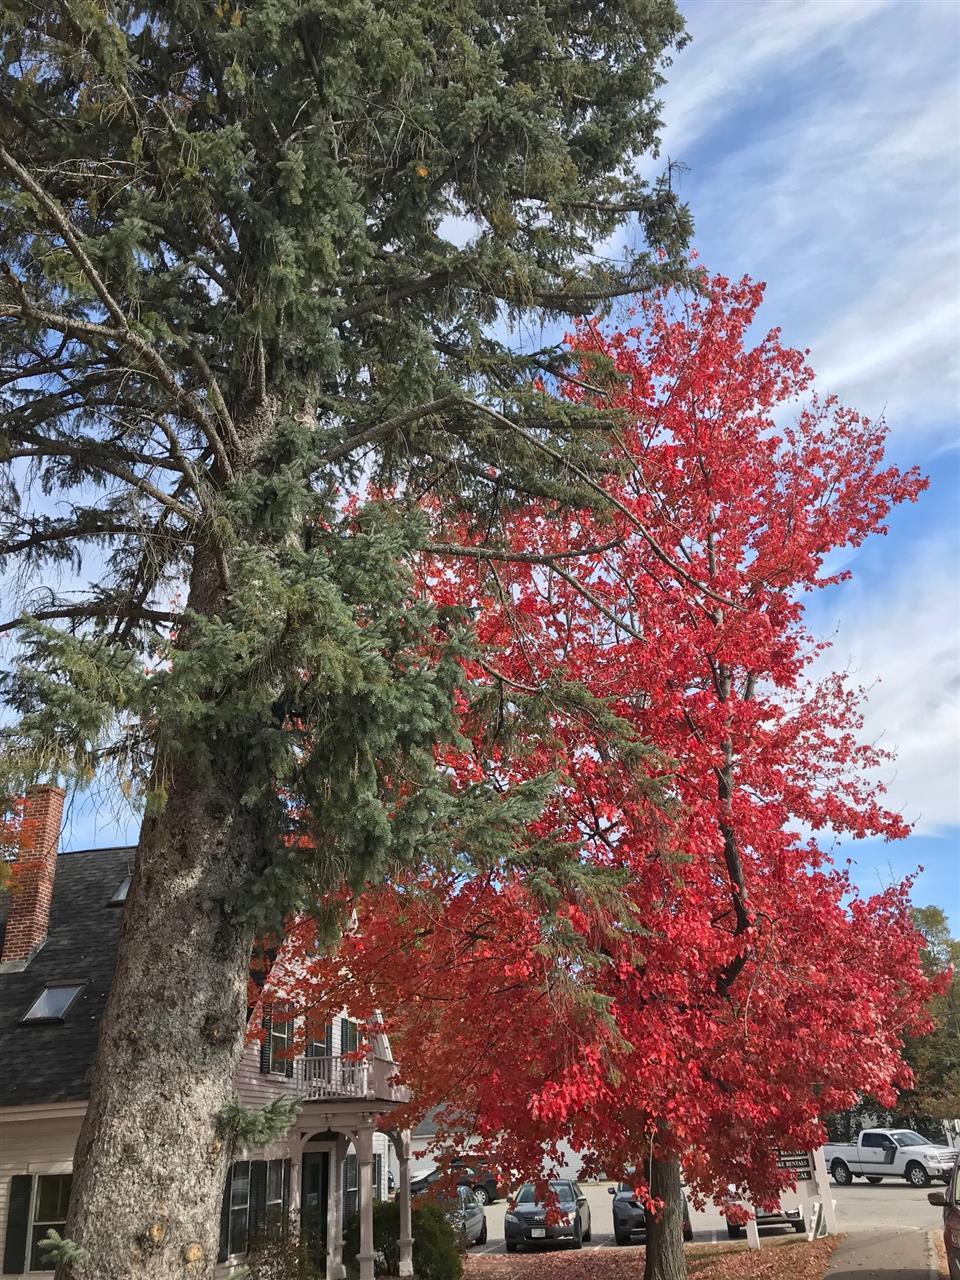 Festive Fall Foliage, Holderness, NH